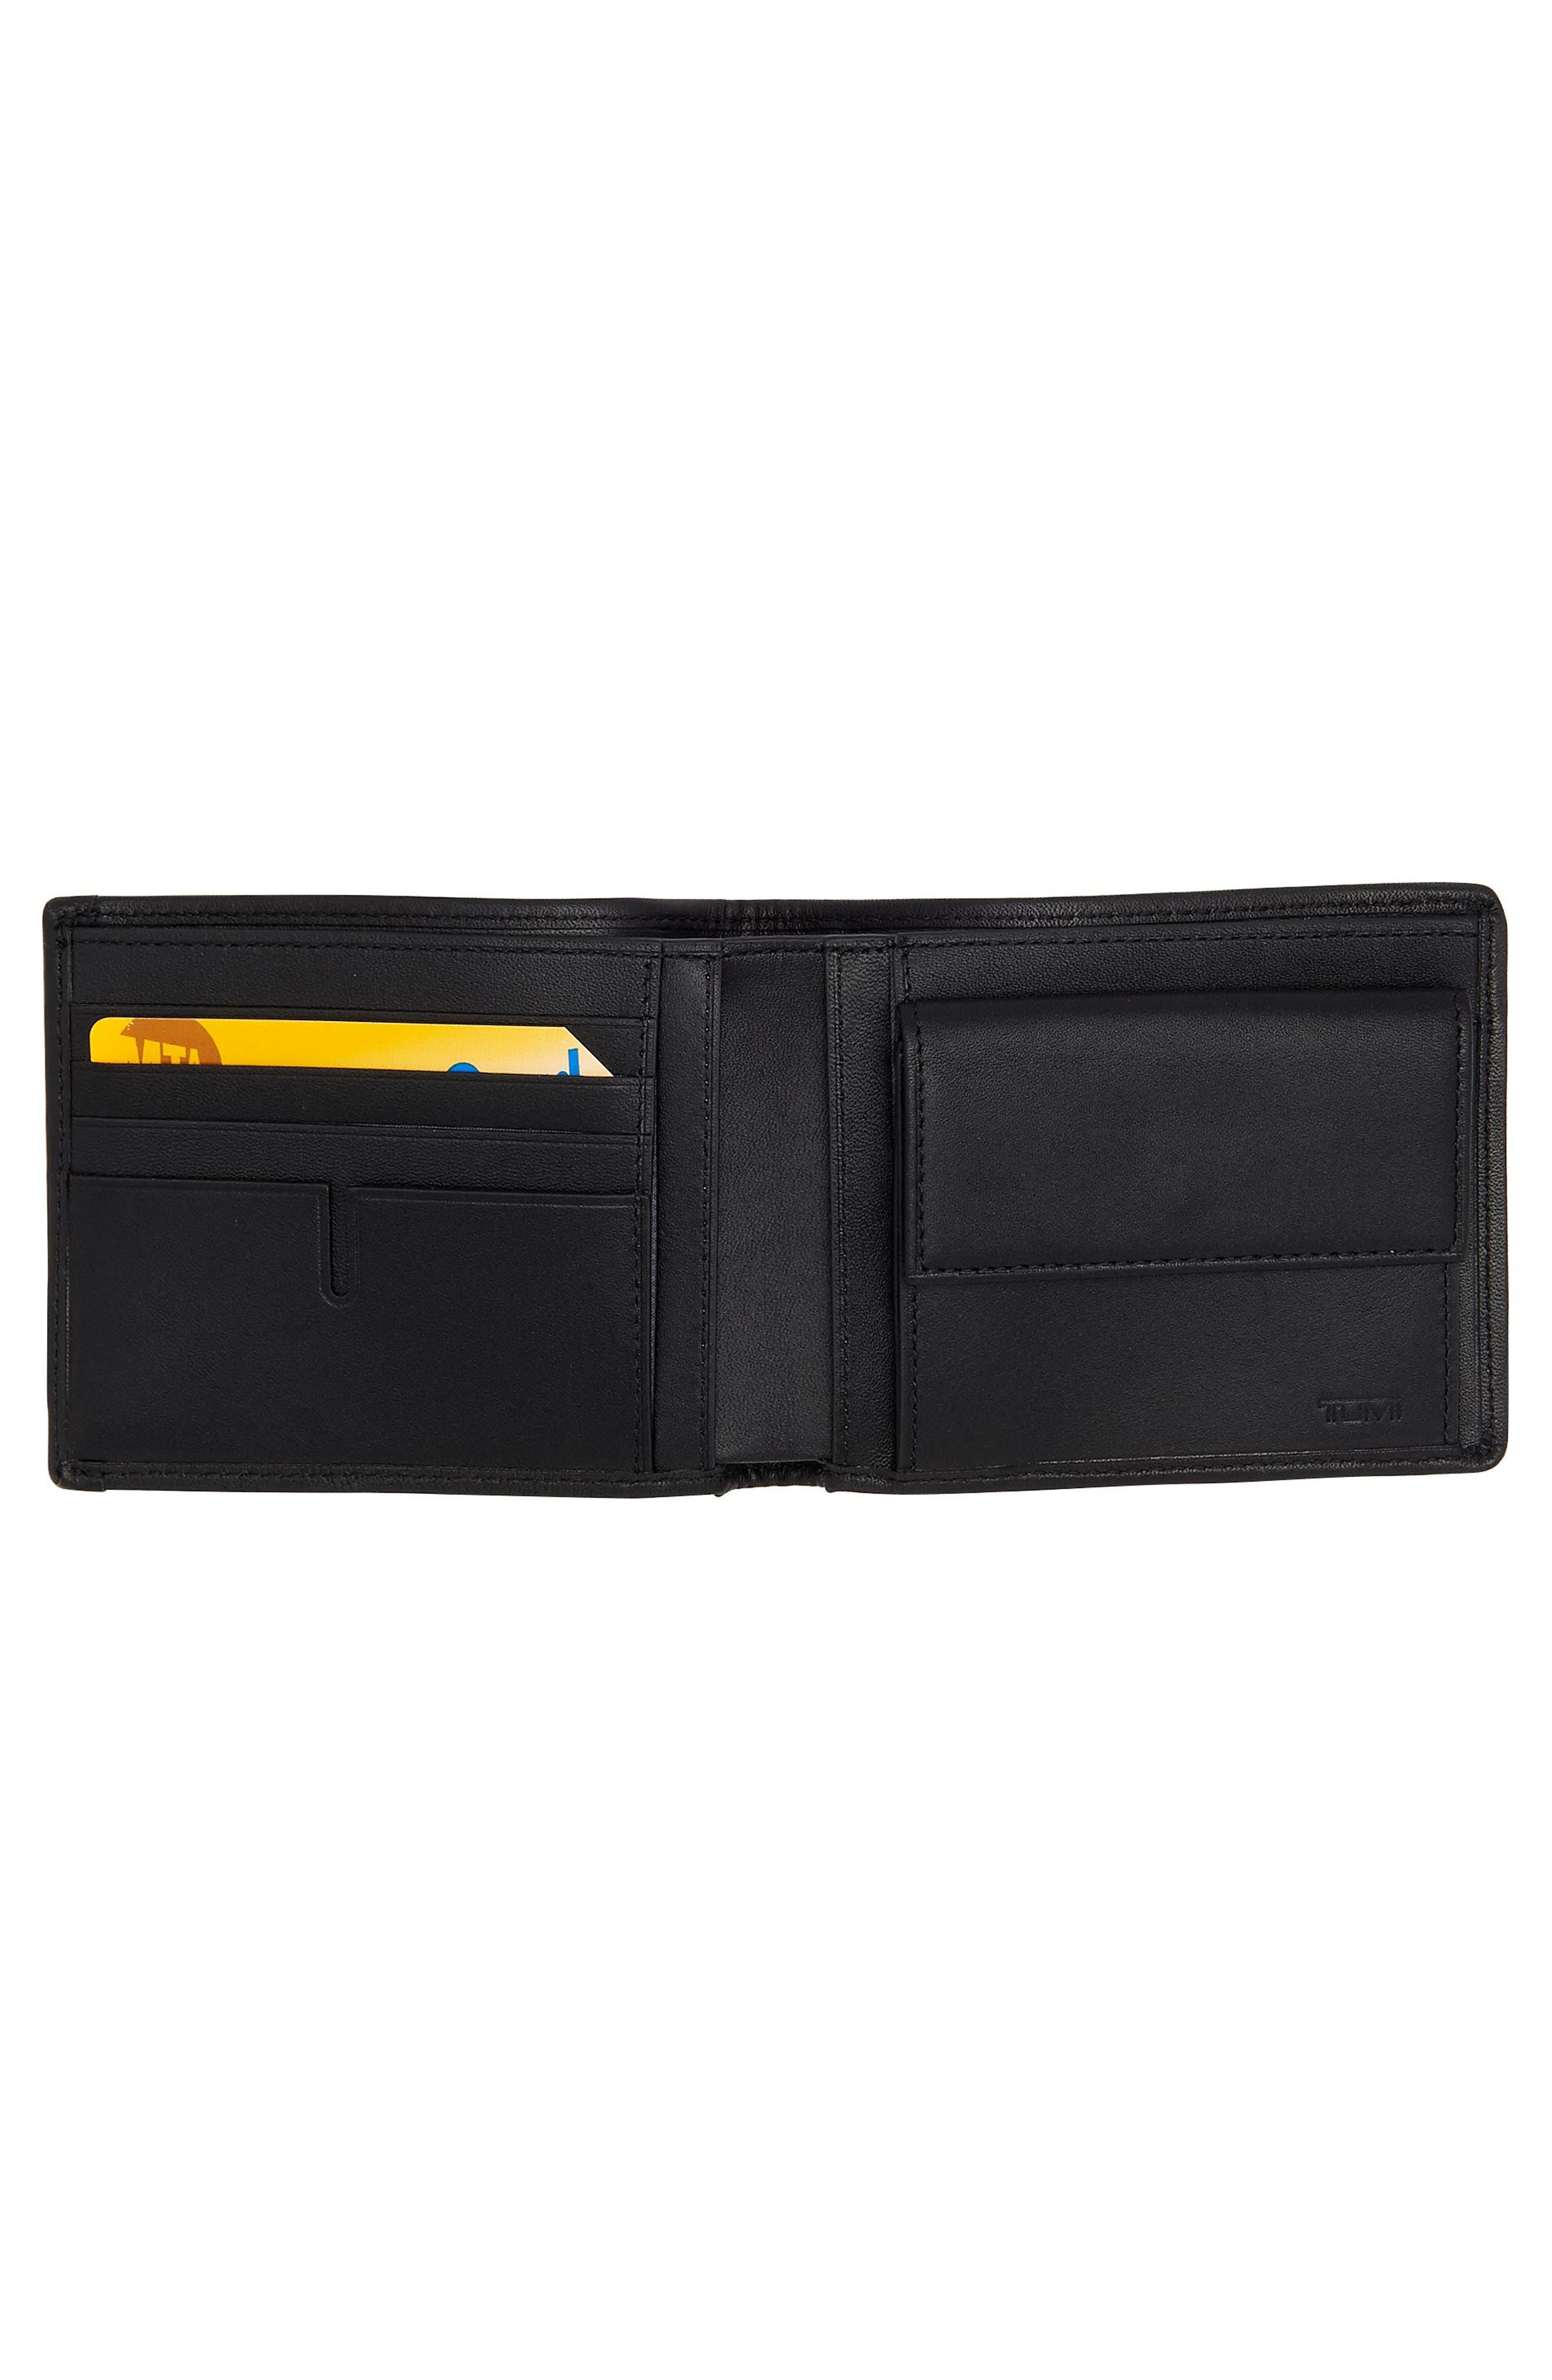 Alpha Global Wallet,                             Alternate thumbnail 2, color,                             Anthracite/ Black